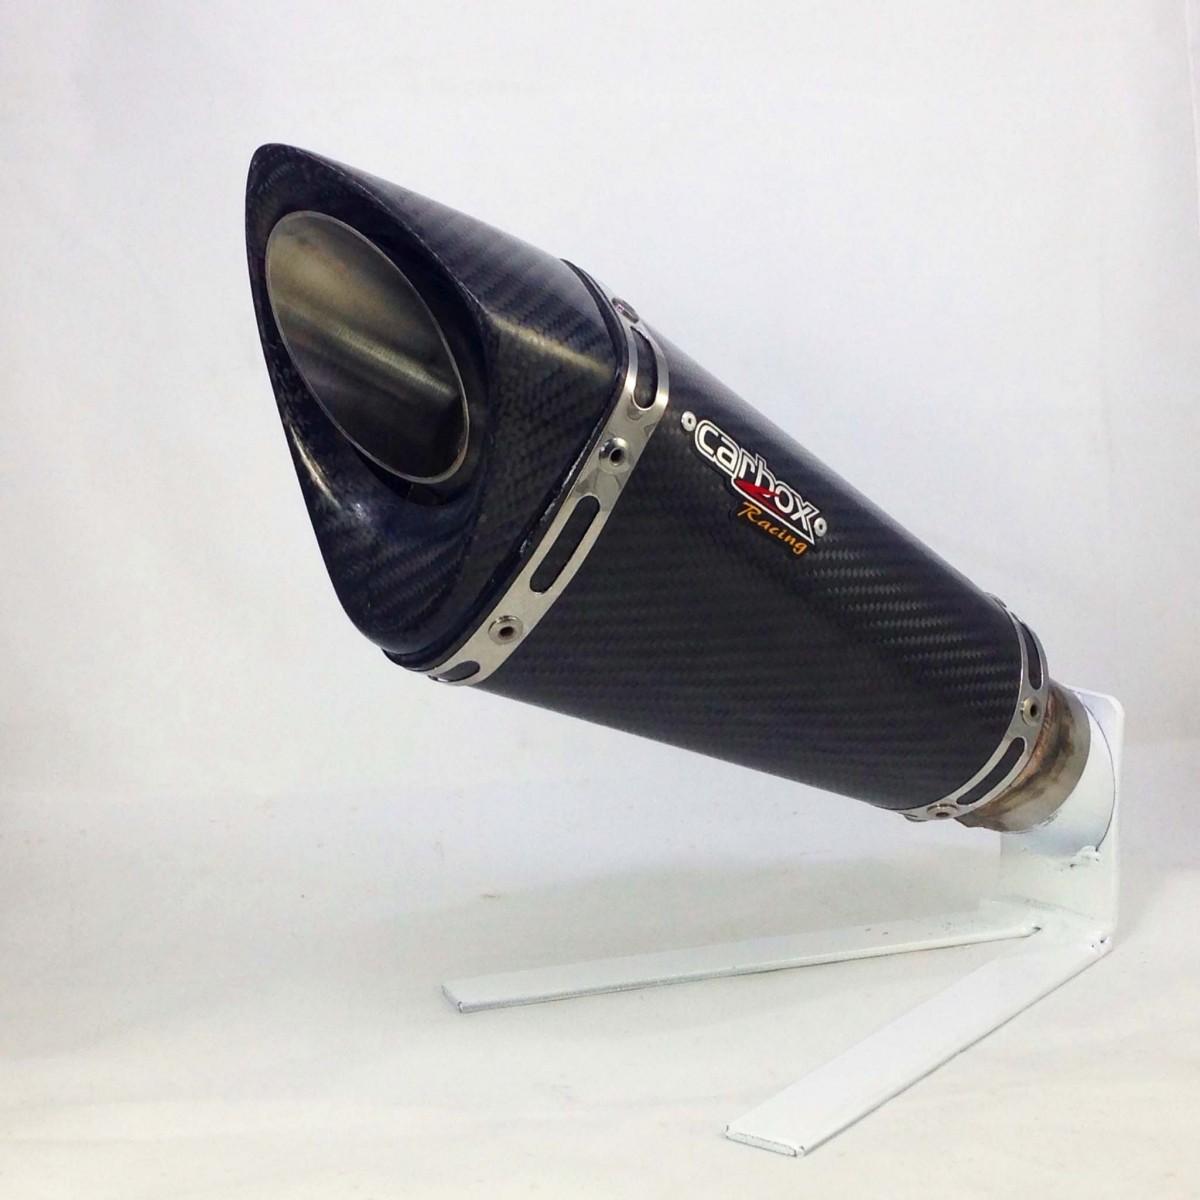 Ponteira Esportiva Scorpion GP 720 Carbon  Triumph Street Triple 675 R